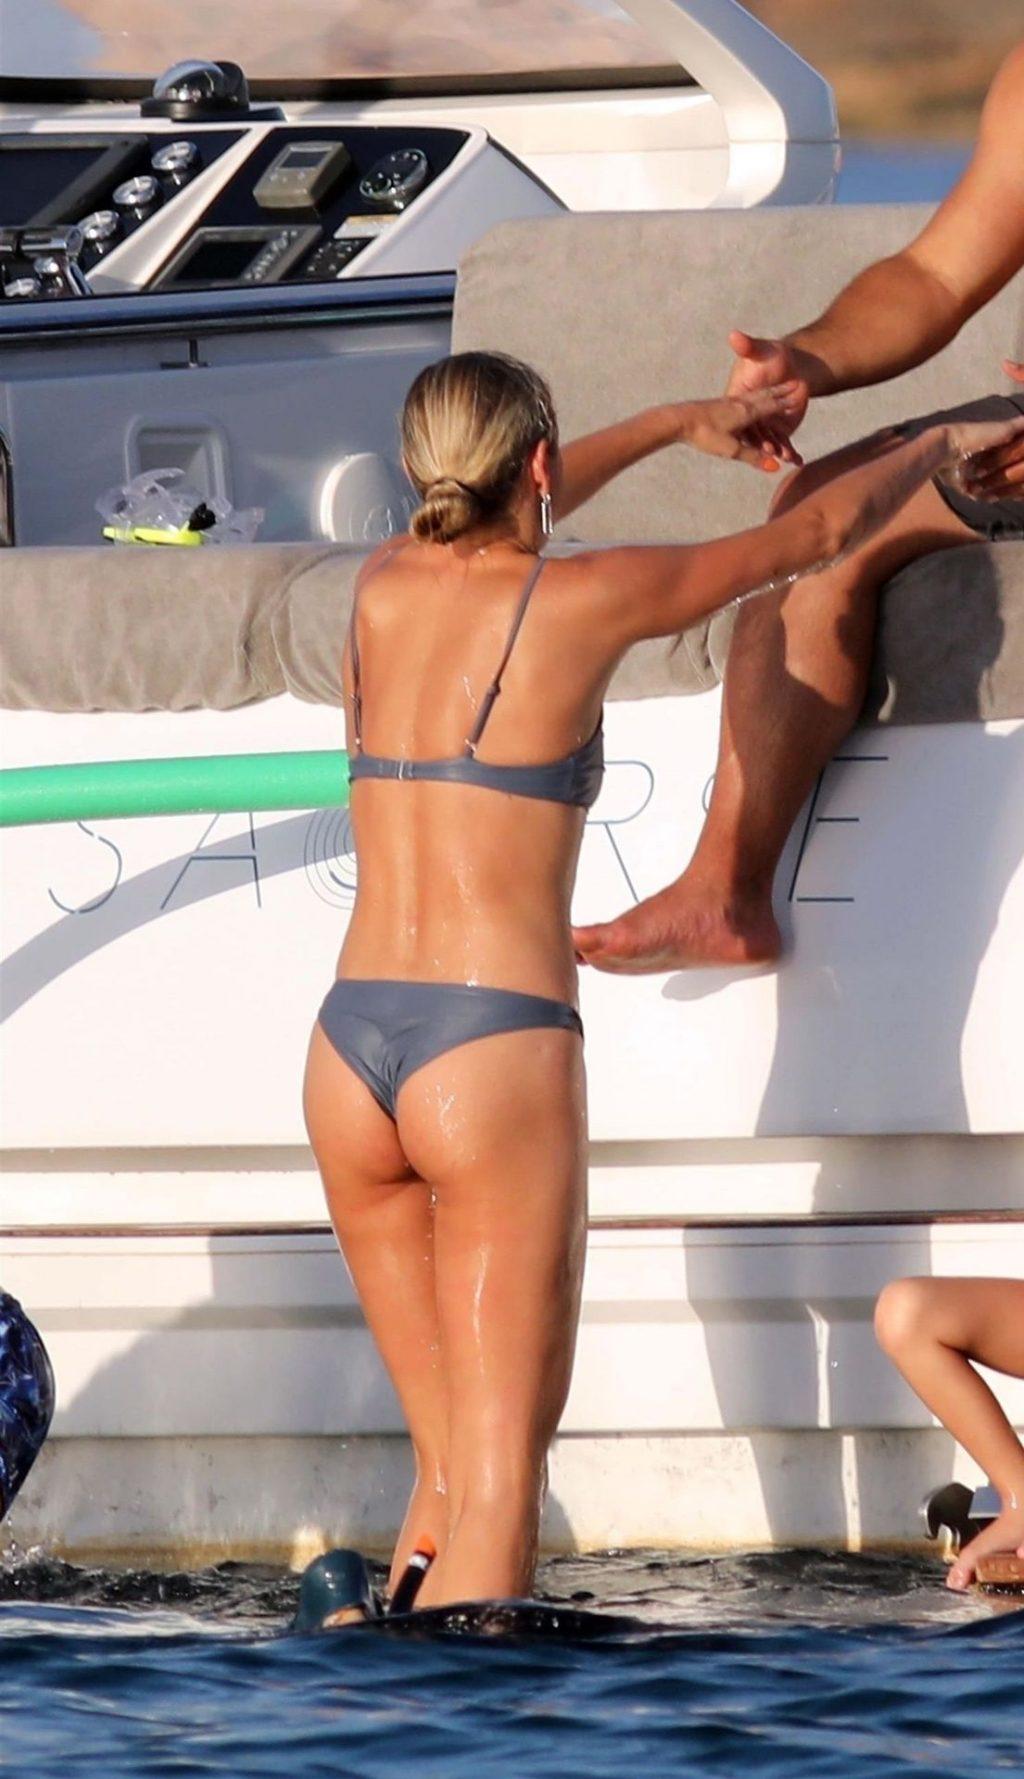 Ronaldo & Celina Locks Enjoy a Day at Sea Aboard a Yacht in Formentera (41 Photos)